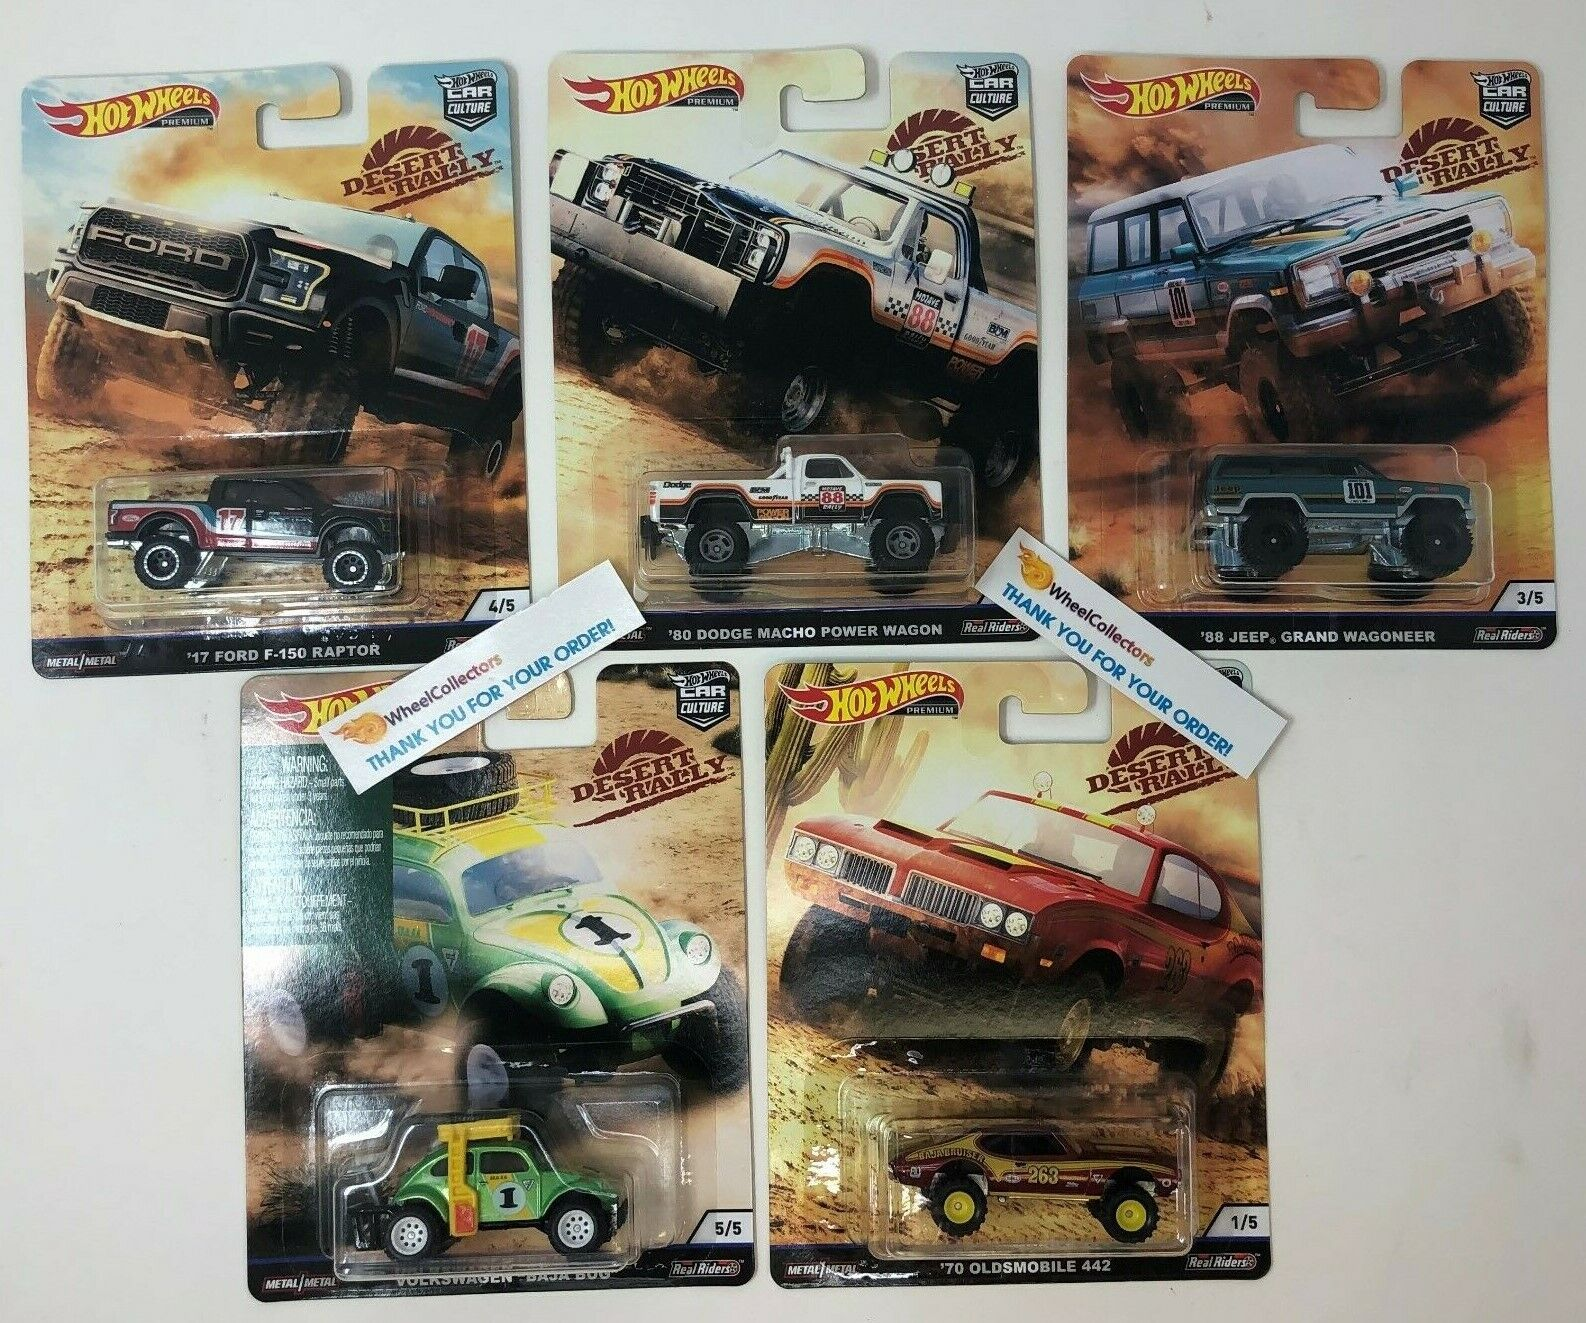 5 Car Set * 2019 Hot Wheels DESERT RALLY Car Culture Case K * IN STOCK